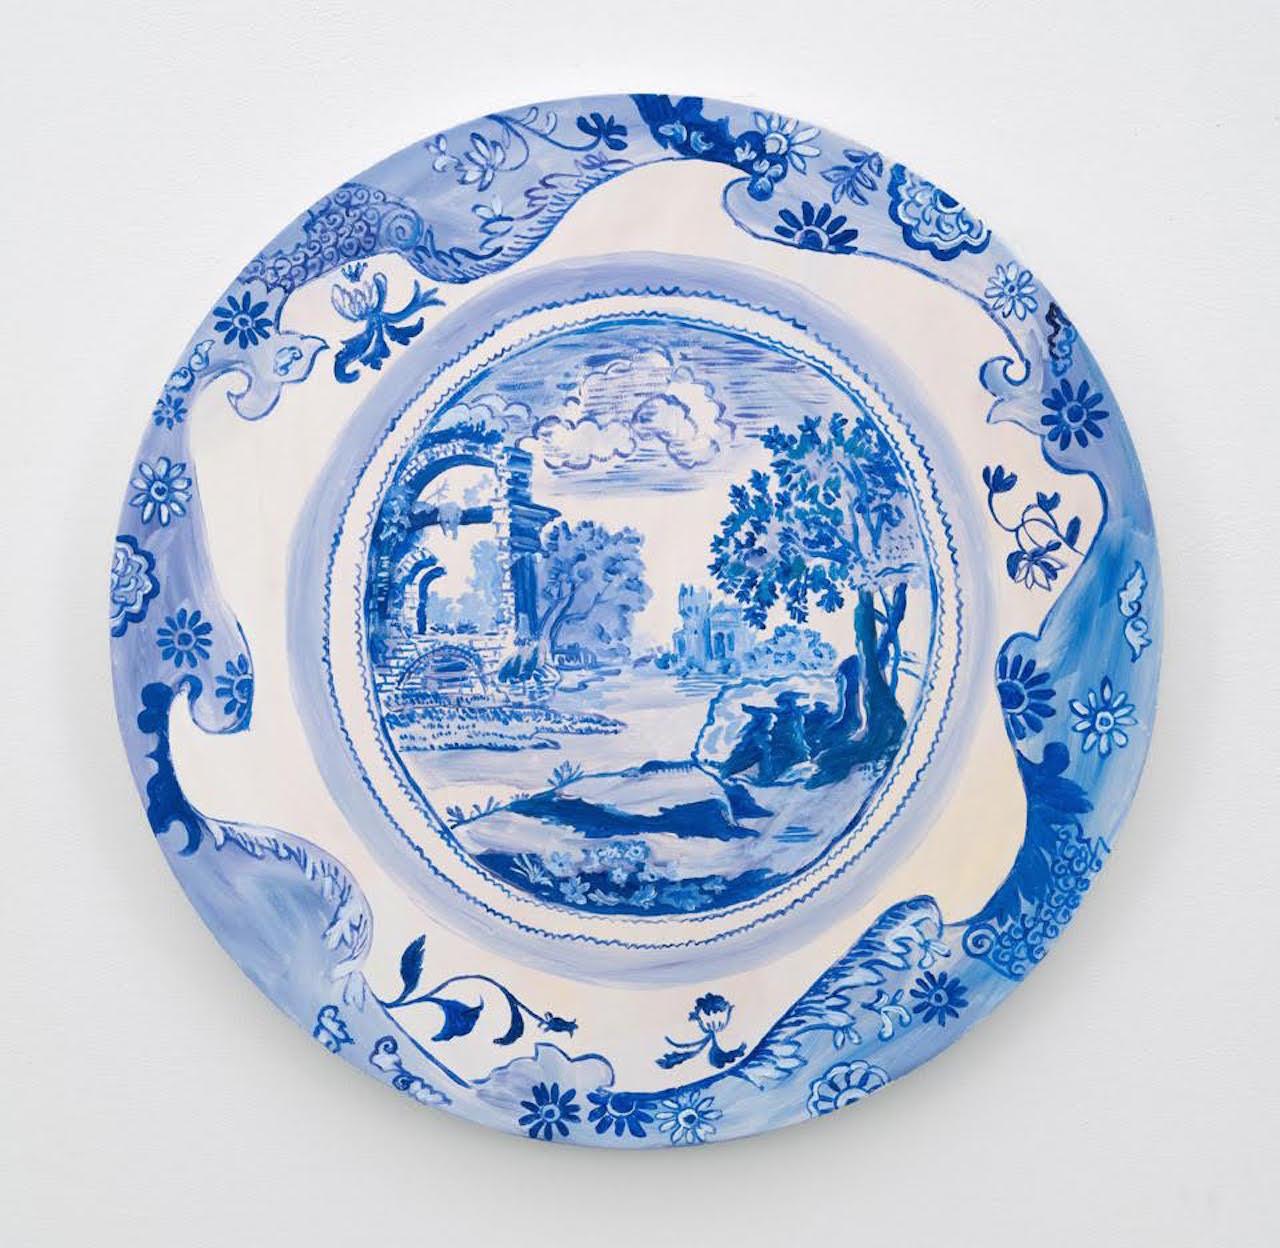 "Karen Kilimnik, ""The Blue and White China Landscape World"" (2015) (image courtesy of the 303 Gallery)"